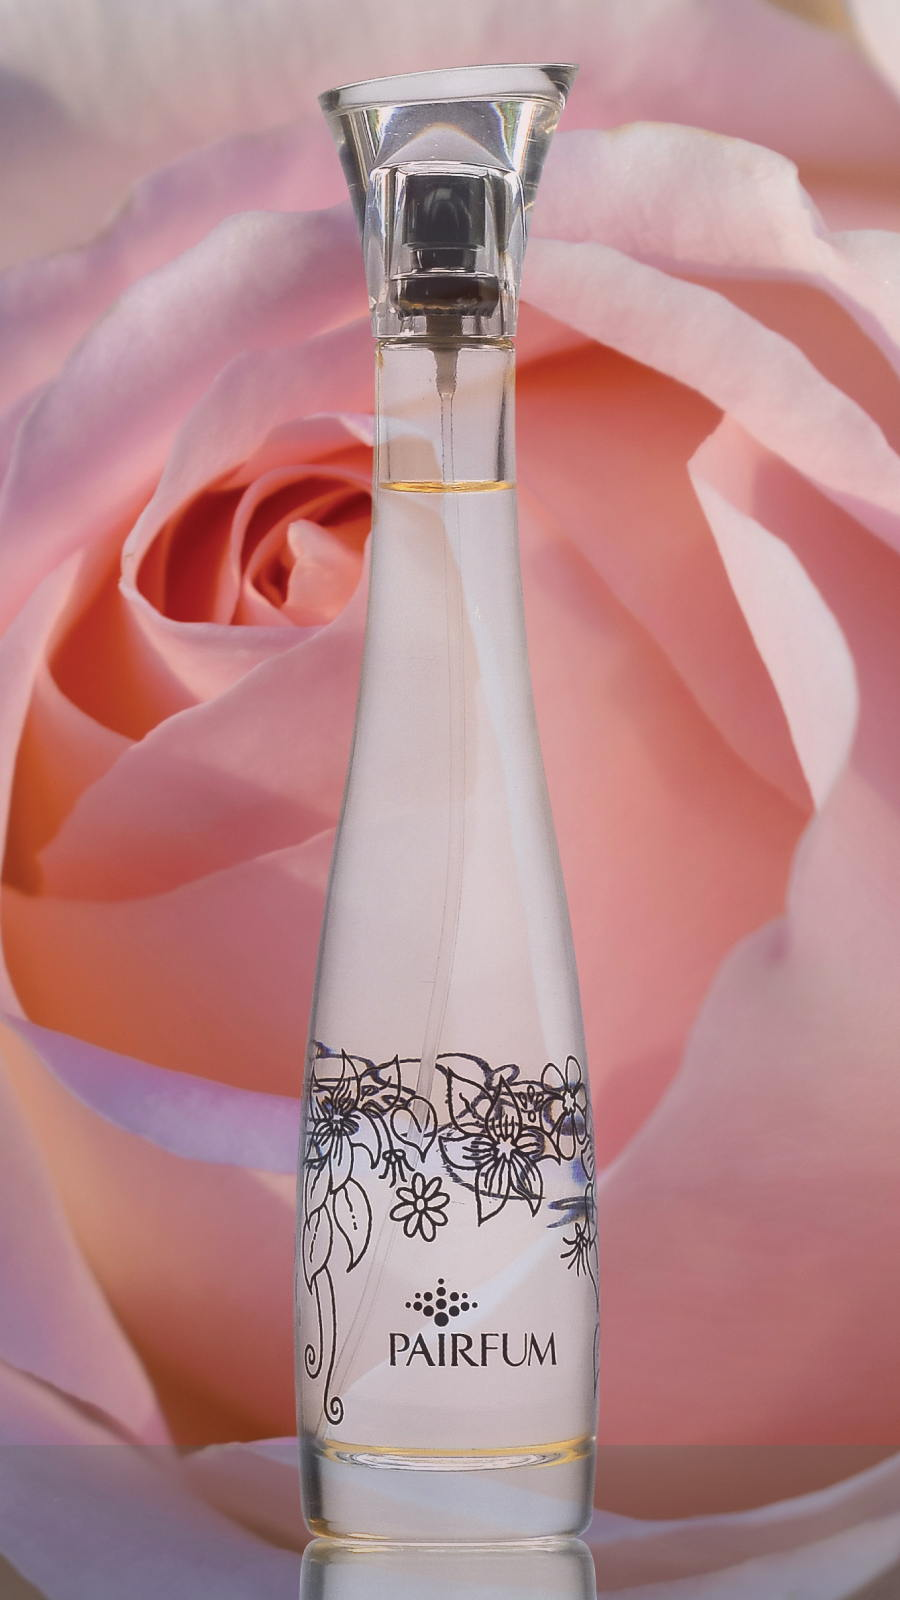 Flacon Room Perfume Spray Rose Pink Flower 9 16